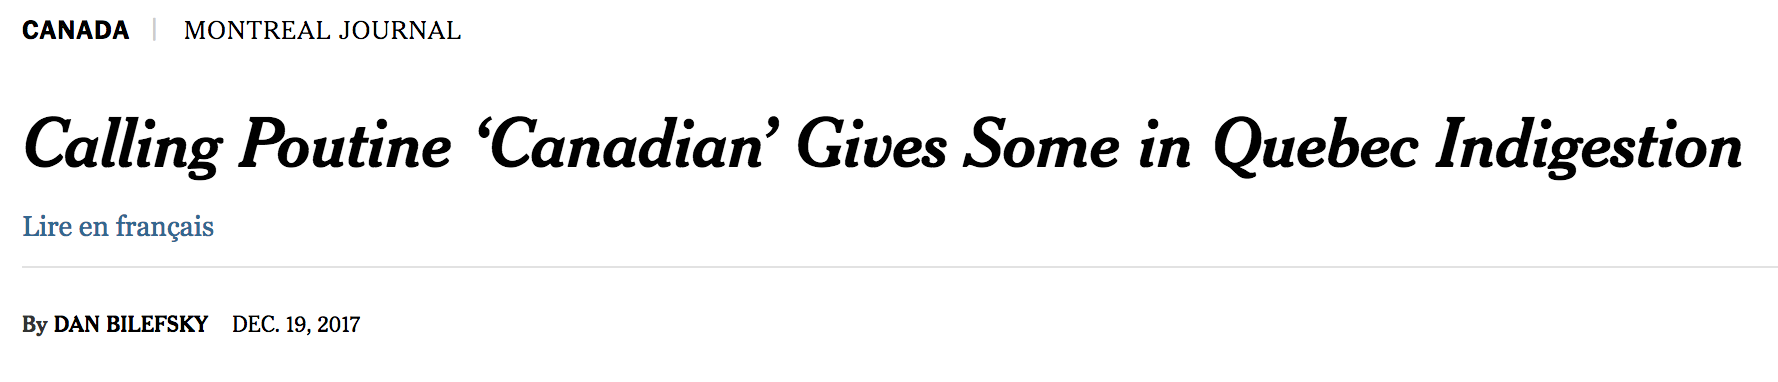 An image of a news headline